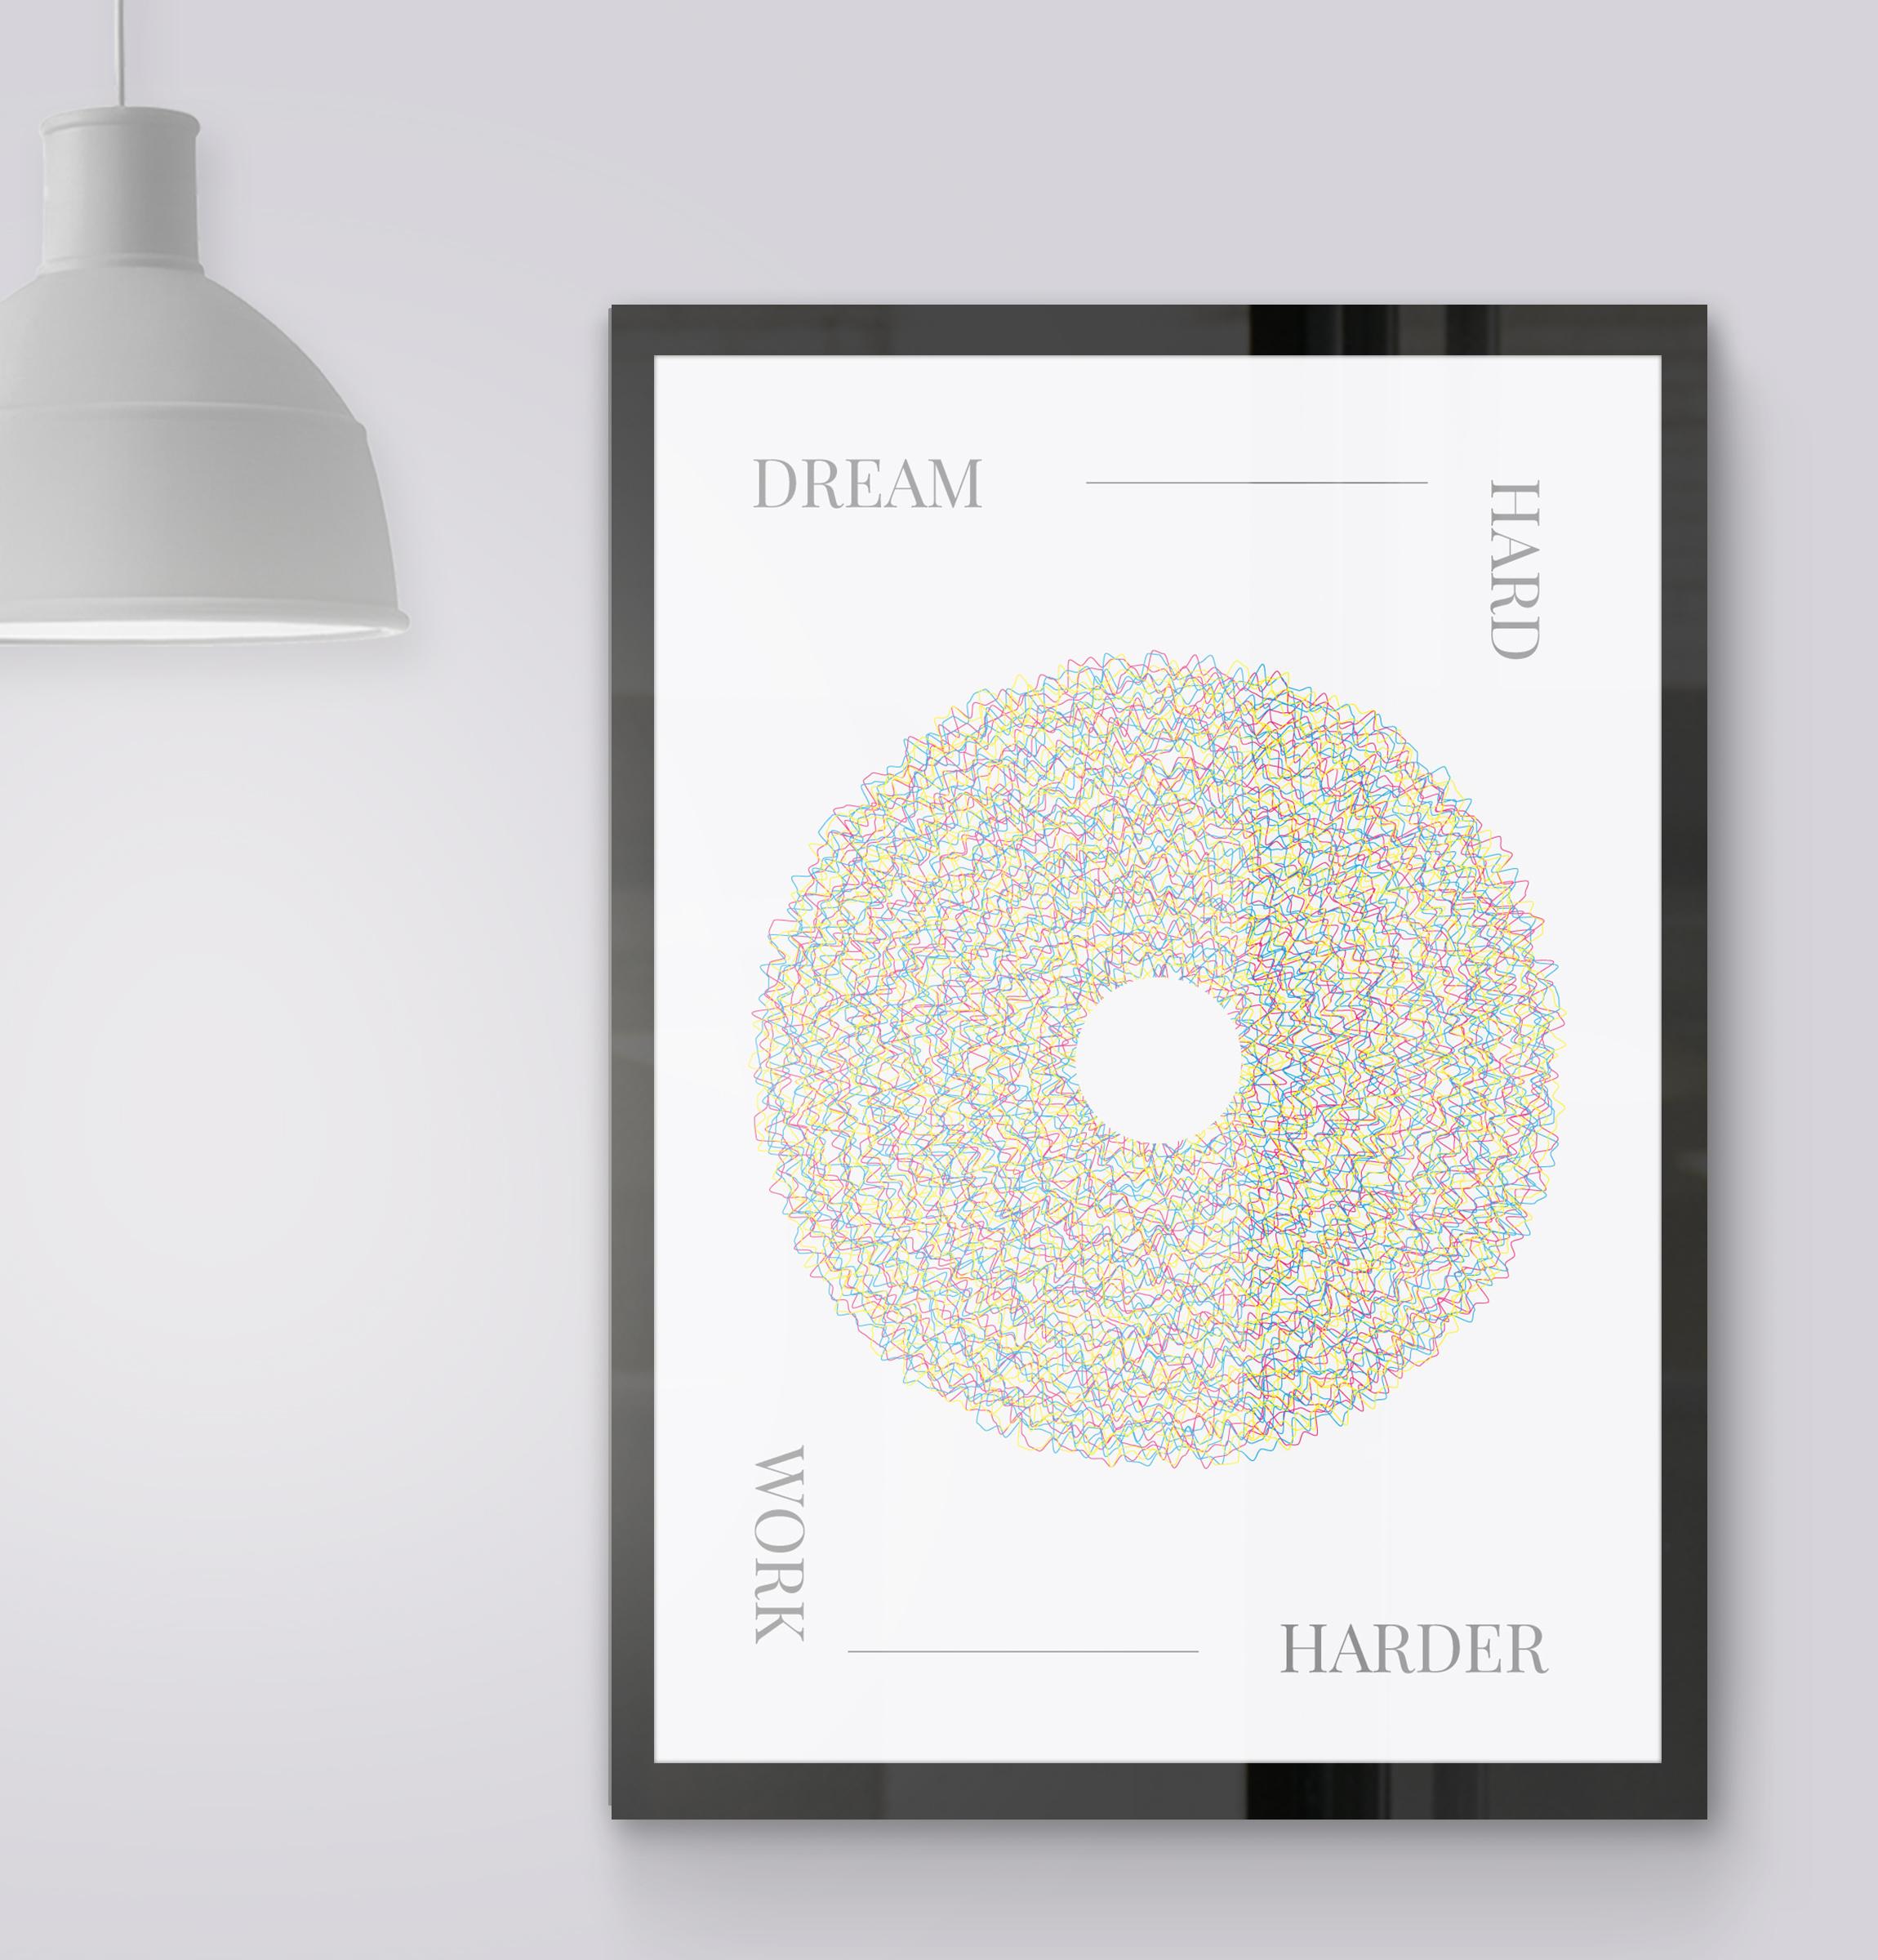 Poster-Frame-PSD-MockUp-2.jpg